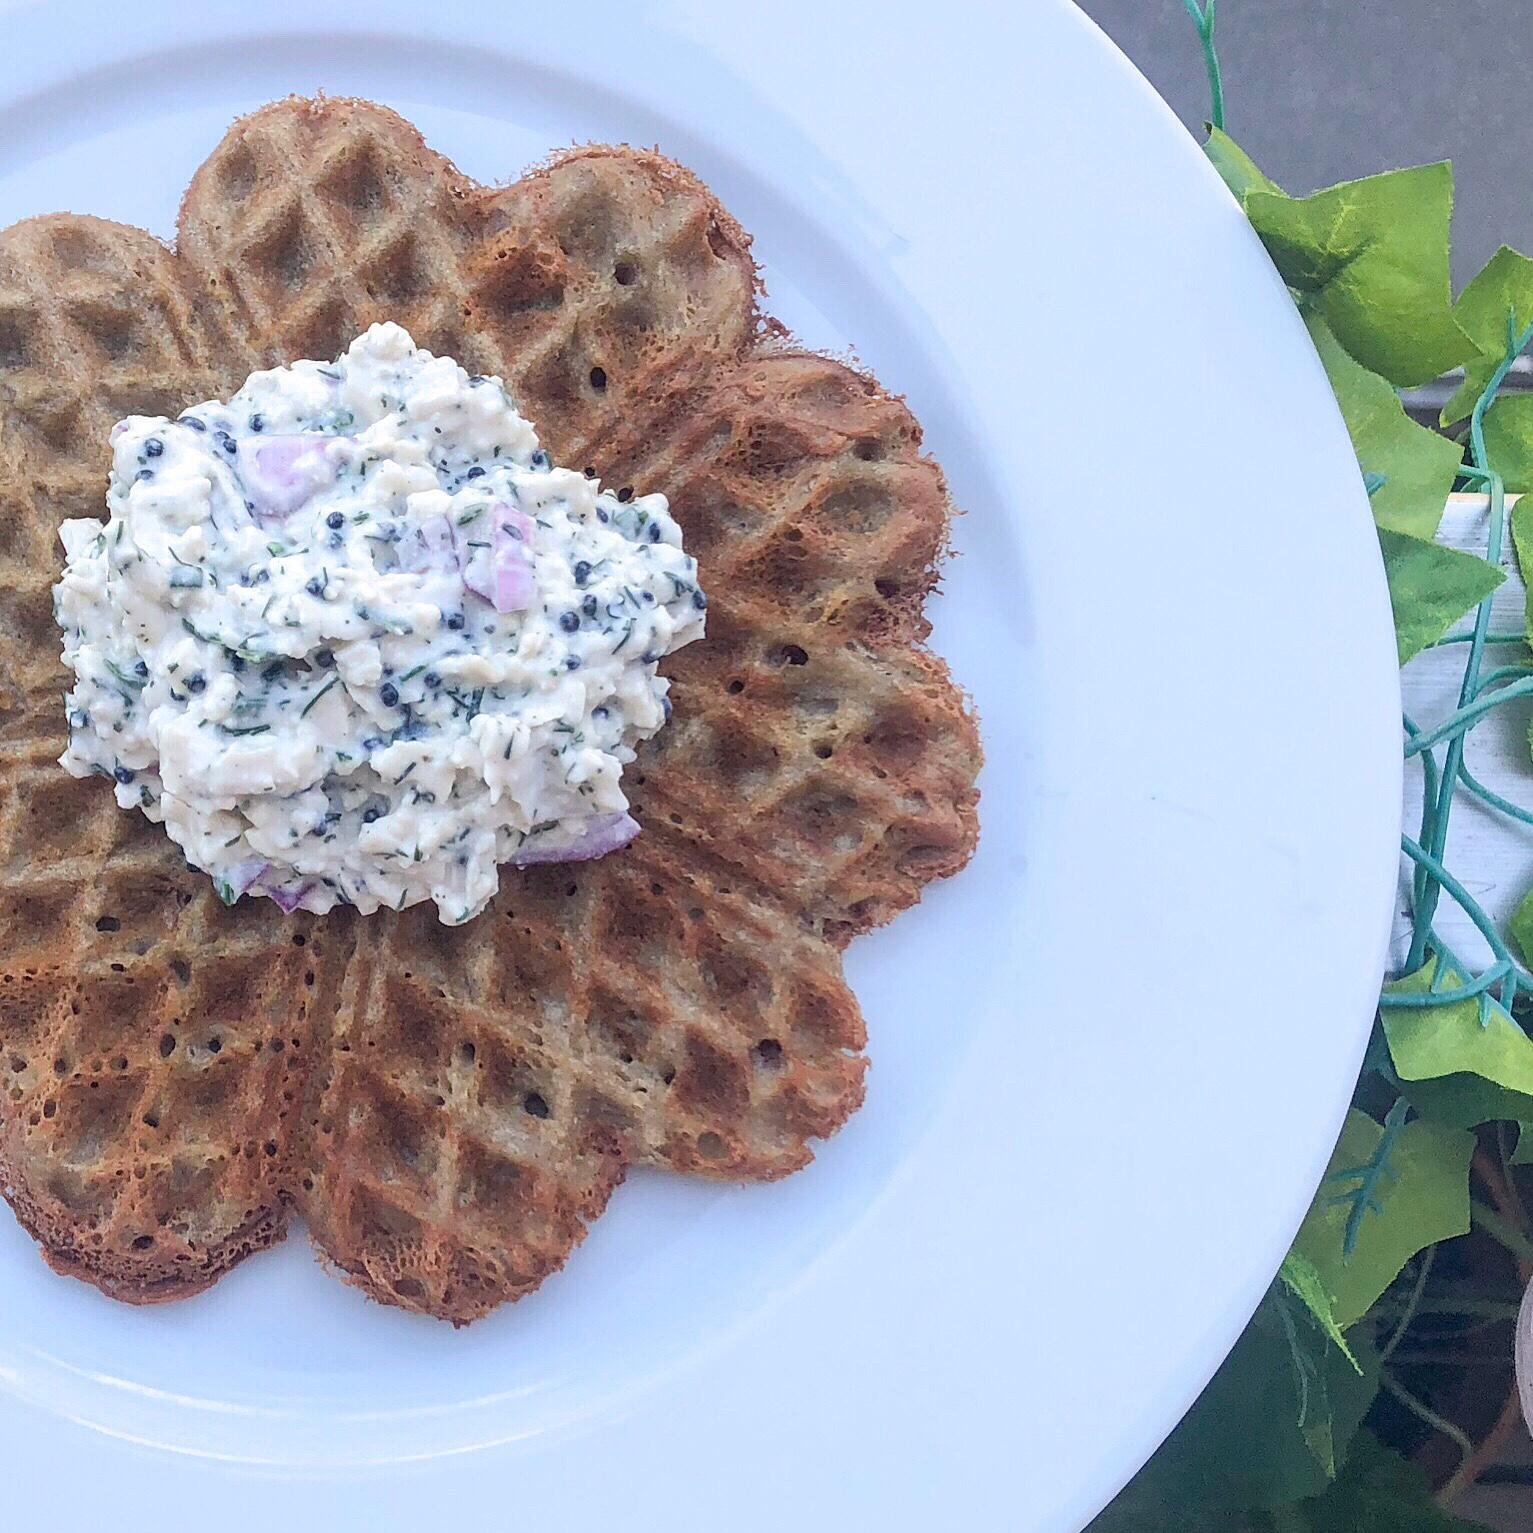 worldofveganita.com quinoa waffles with Skagen topping: